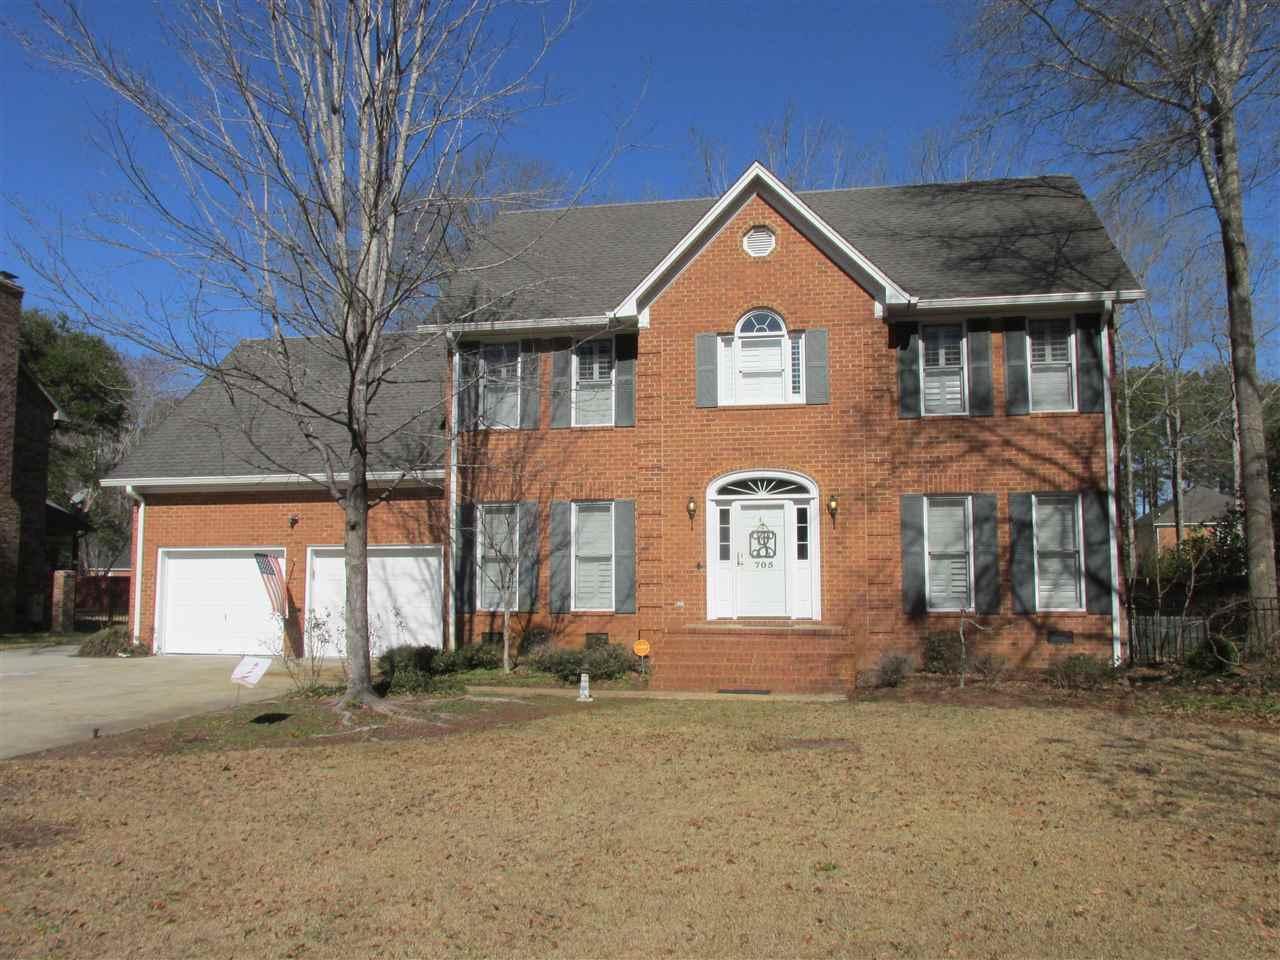 705 lancelot dr florence sc mls 131195 better homes for Home builders florence sc